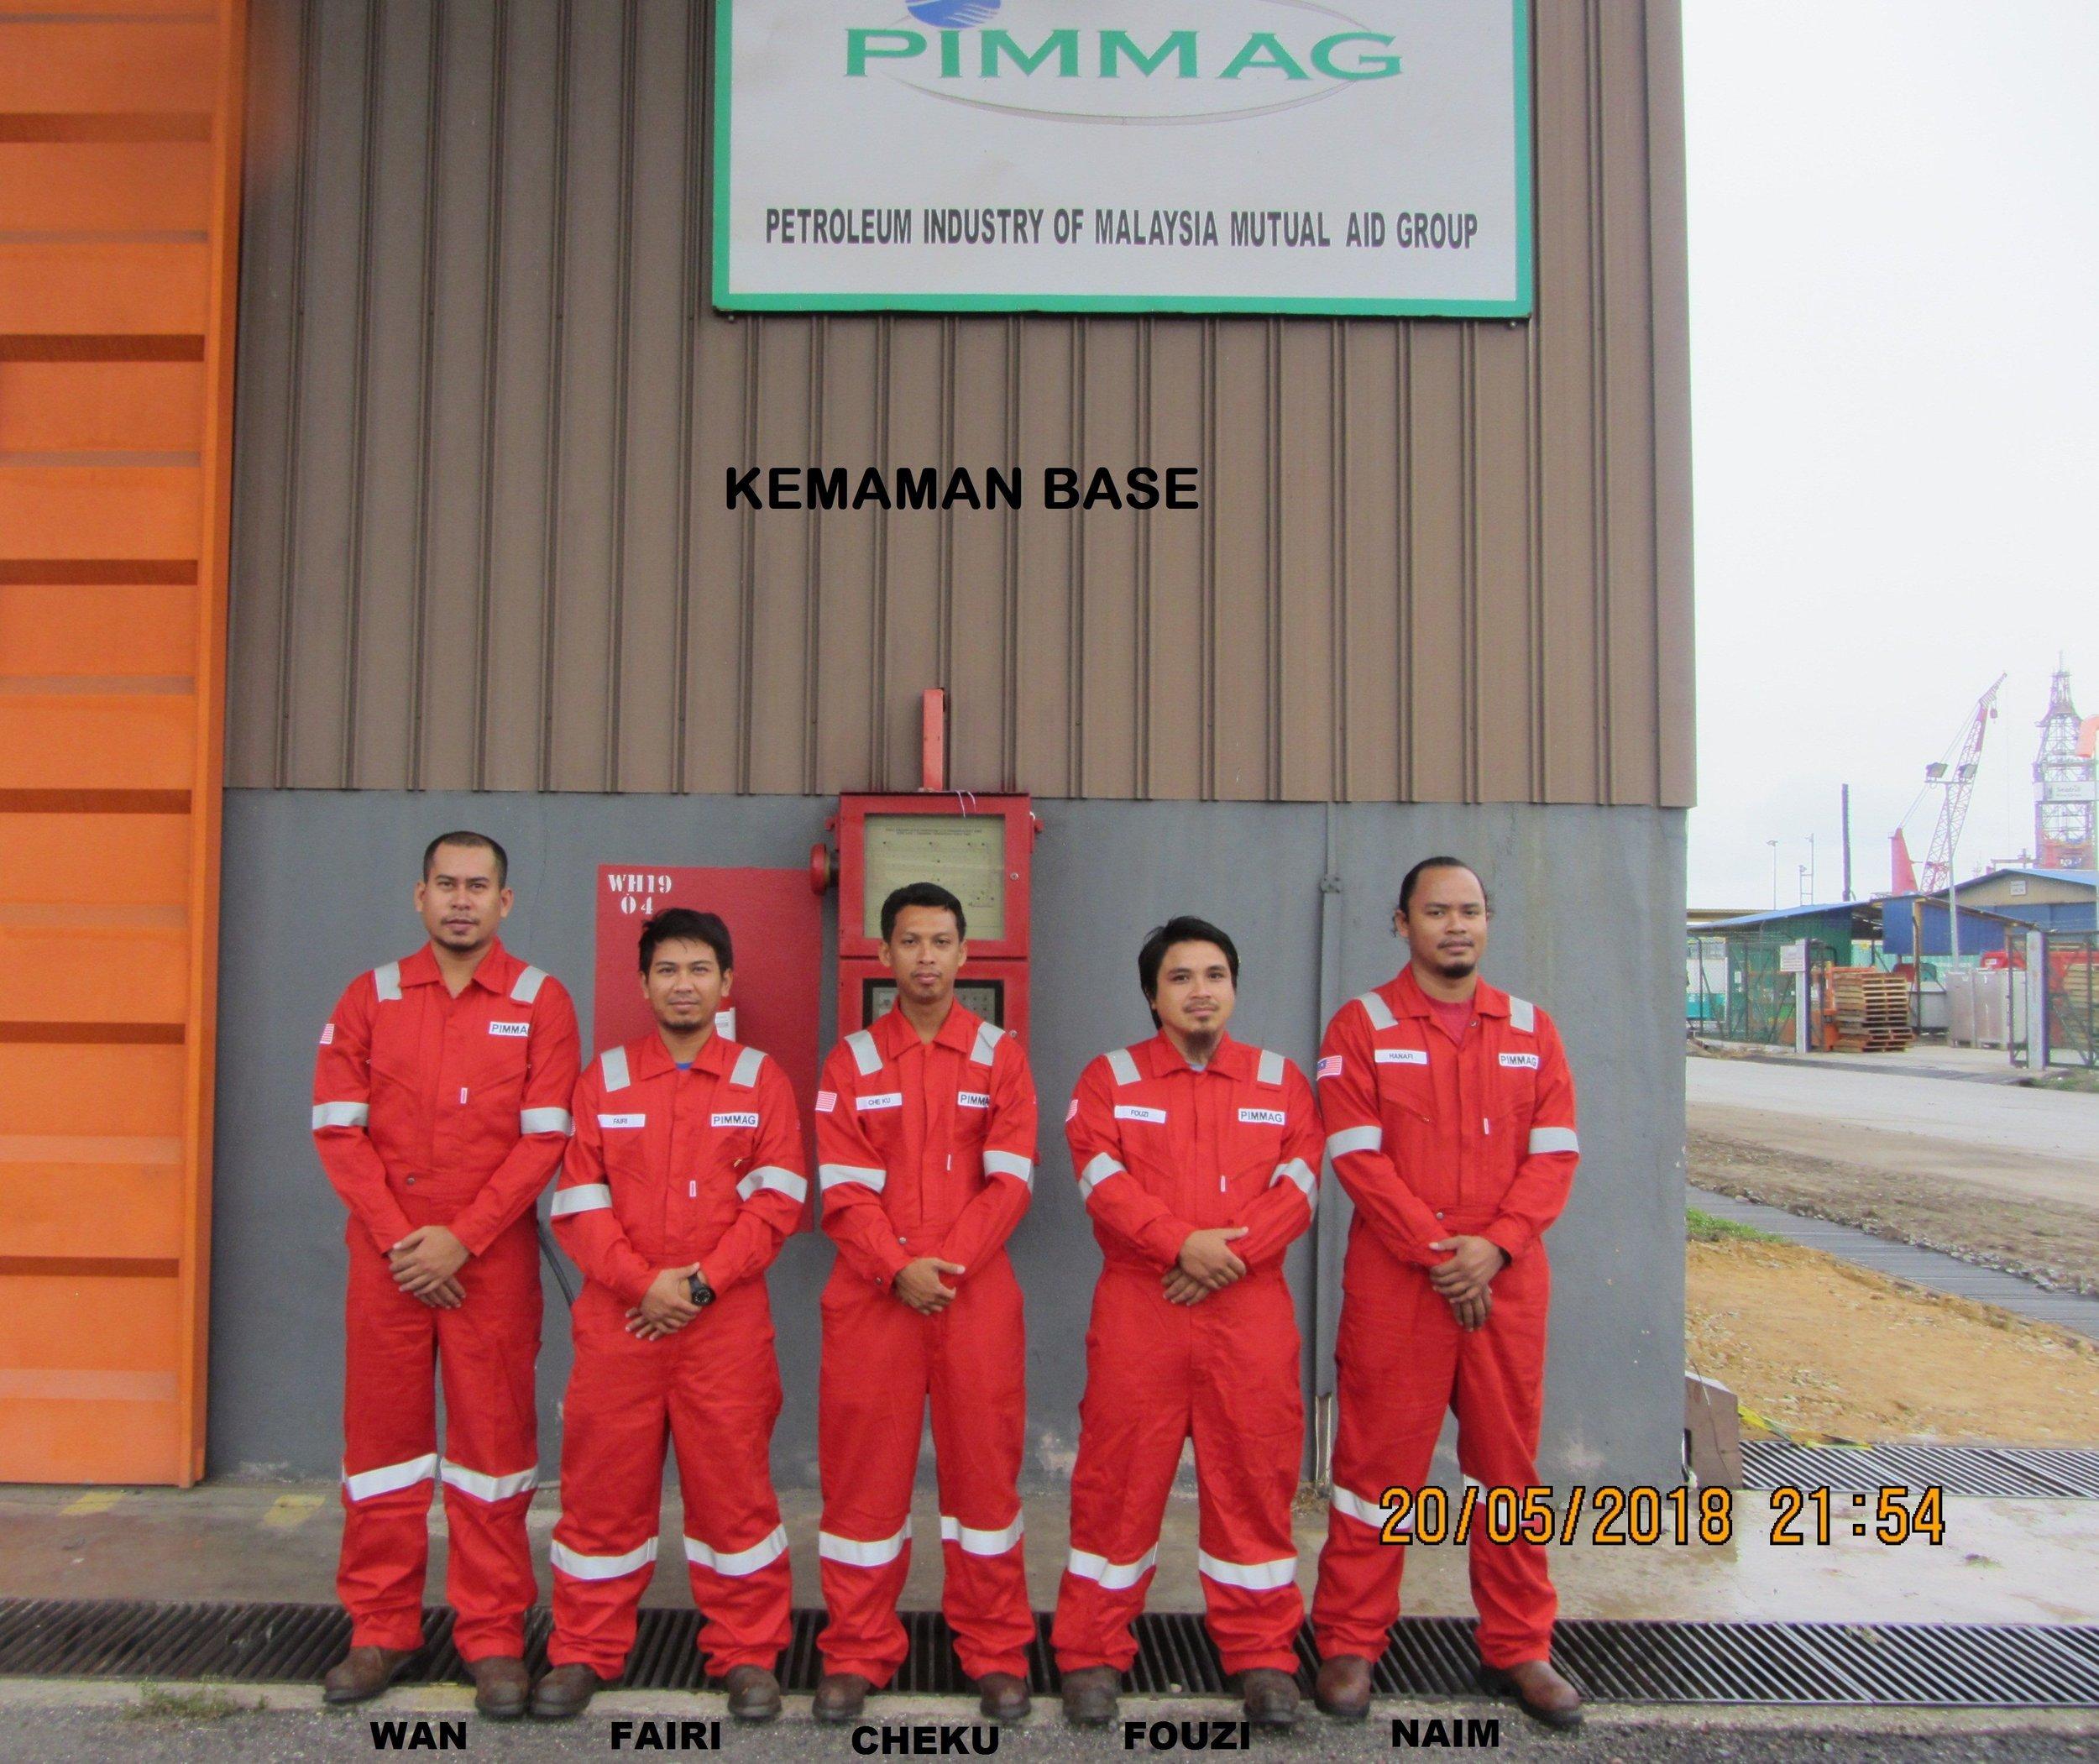 Kemaman Base Group photo 2018.jpg